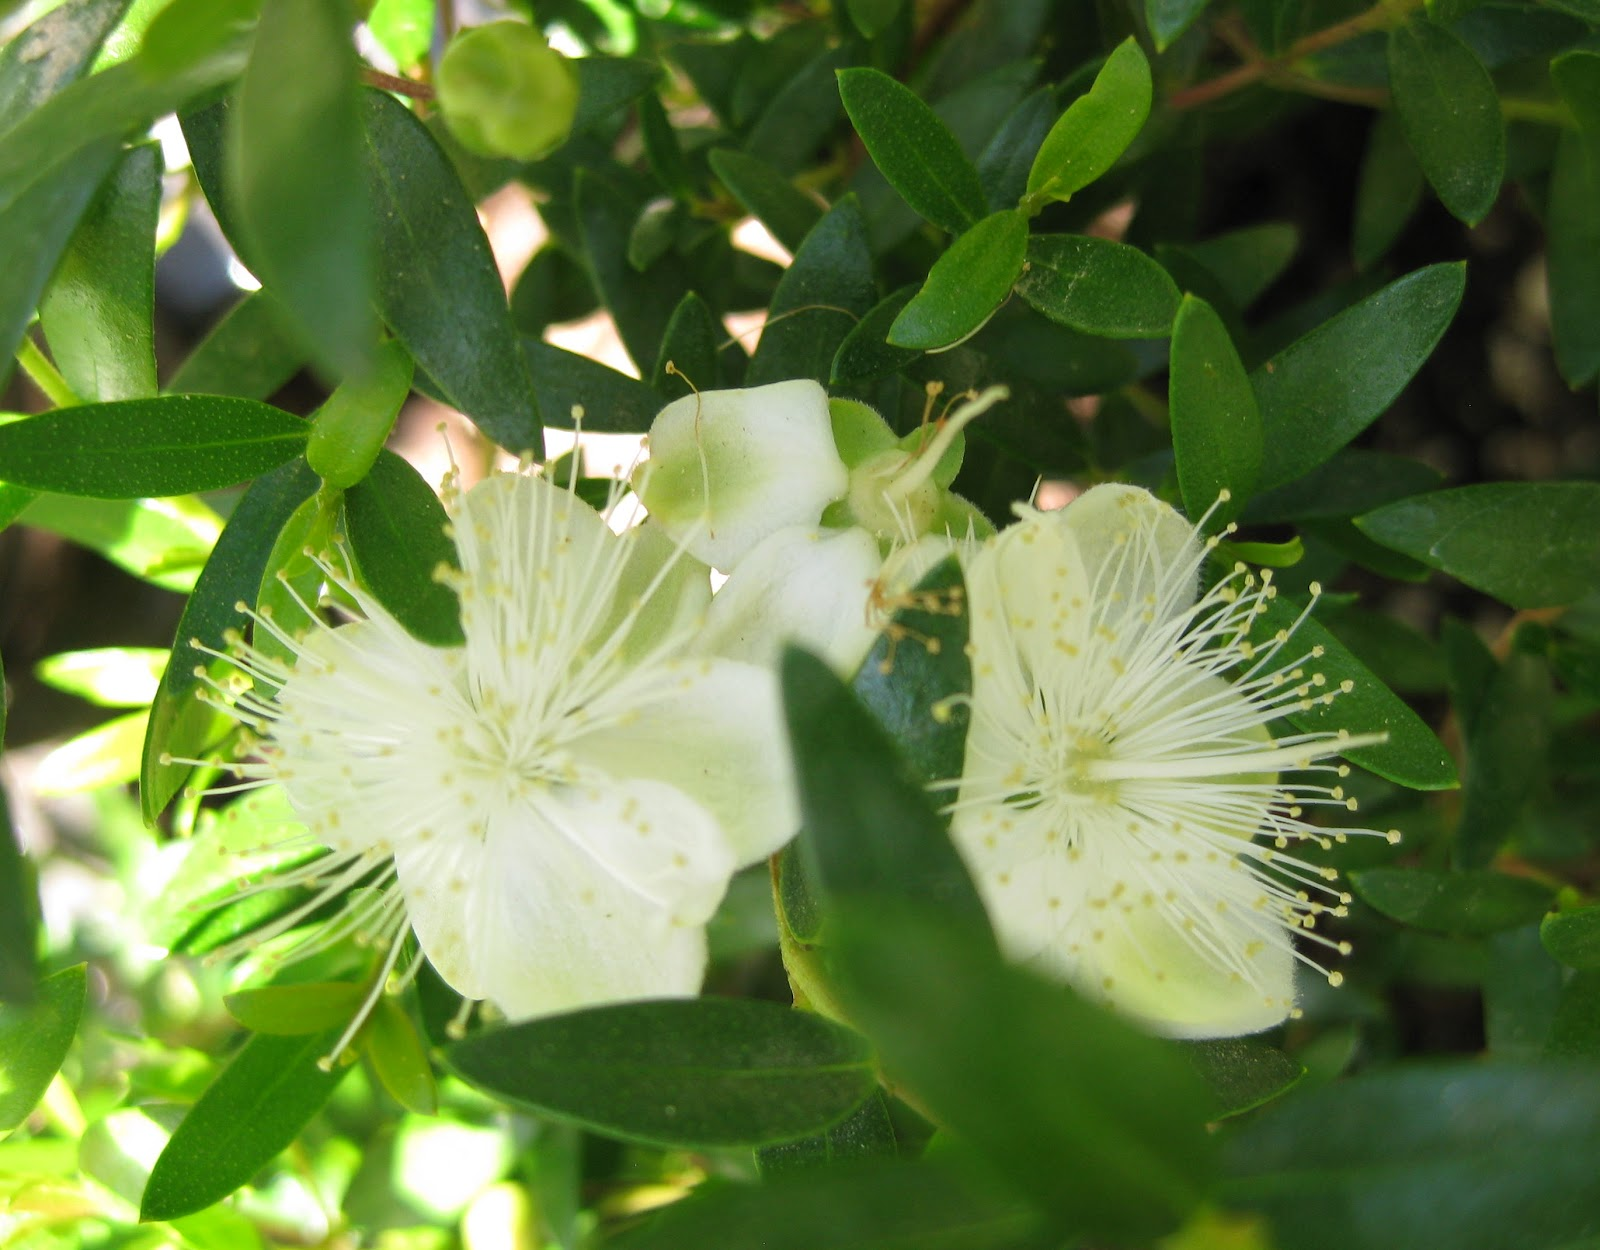 Dwarf Myrtle flowers